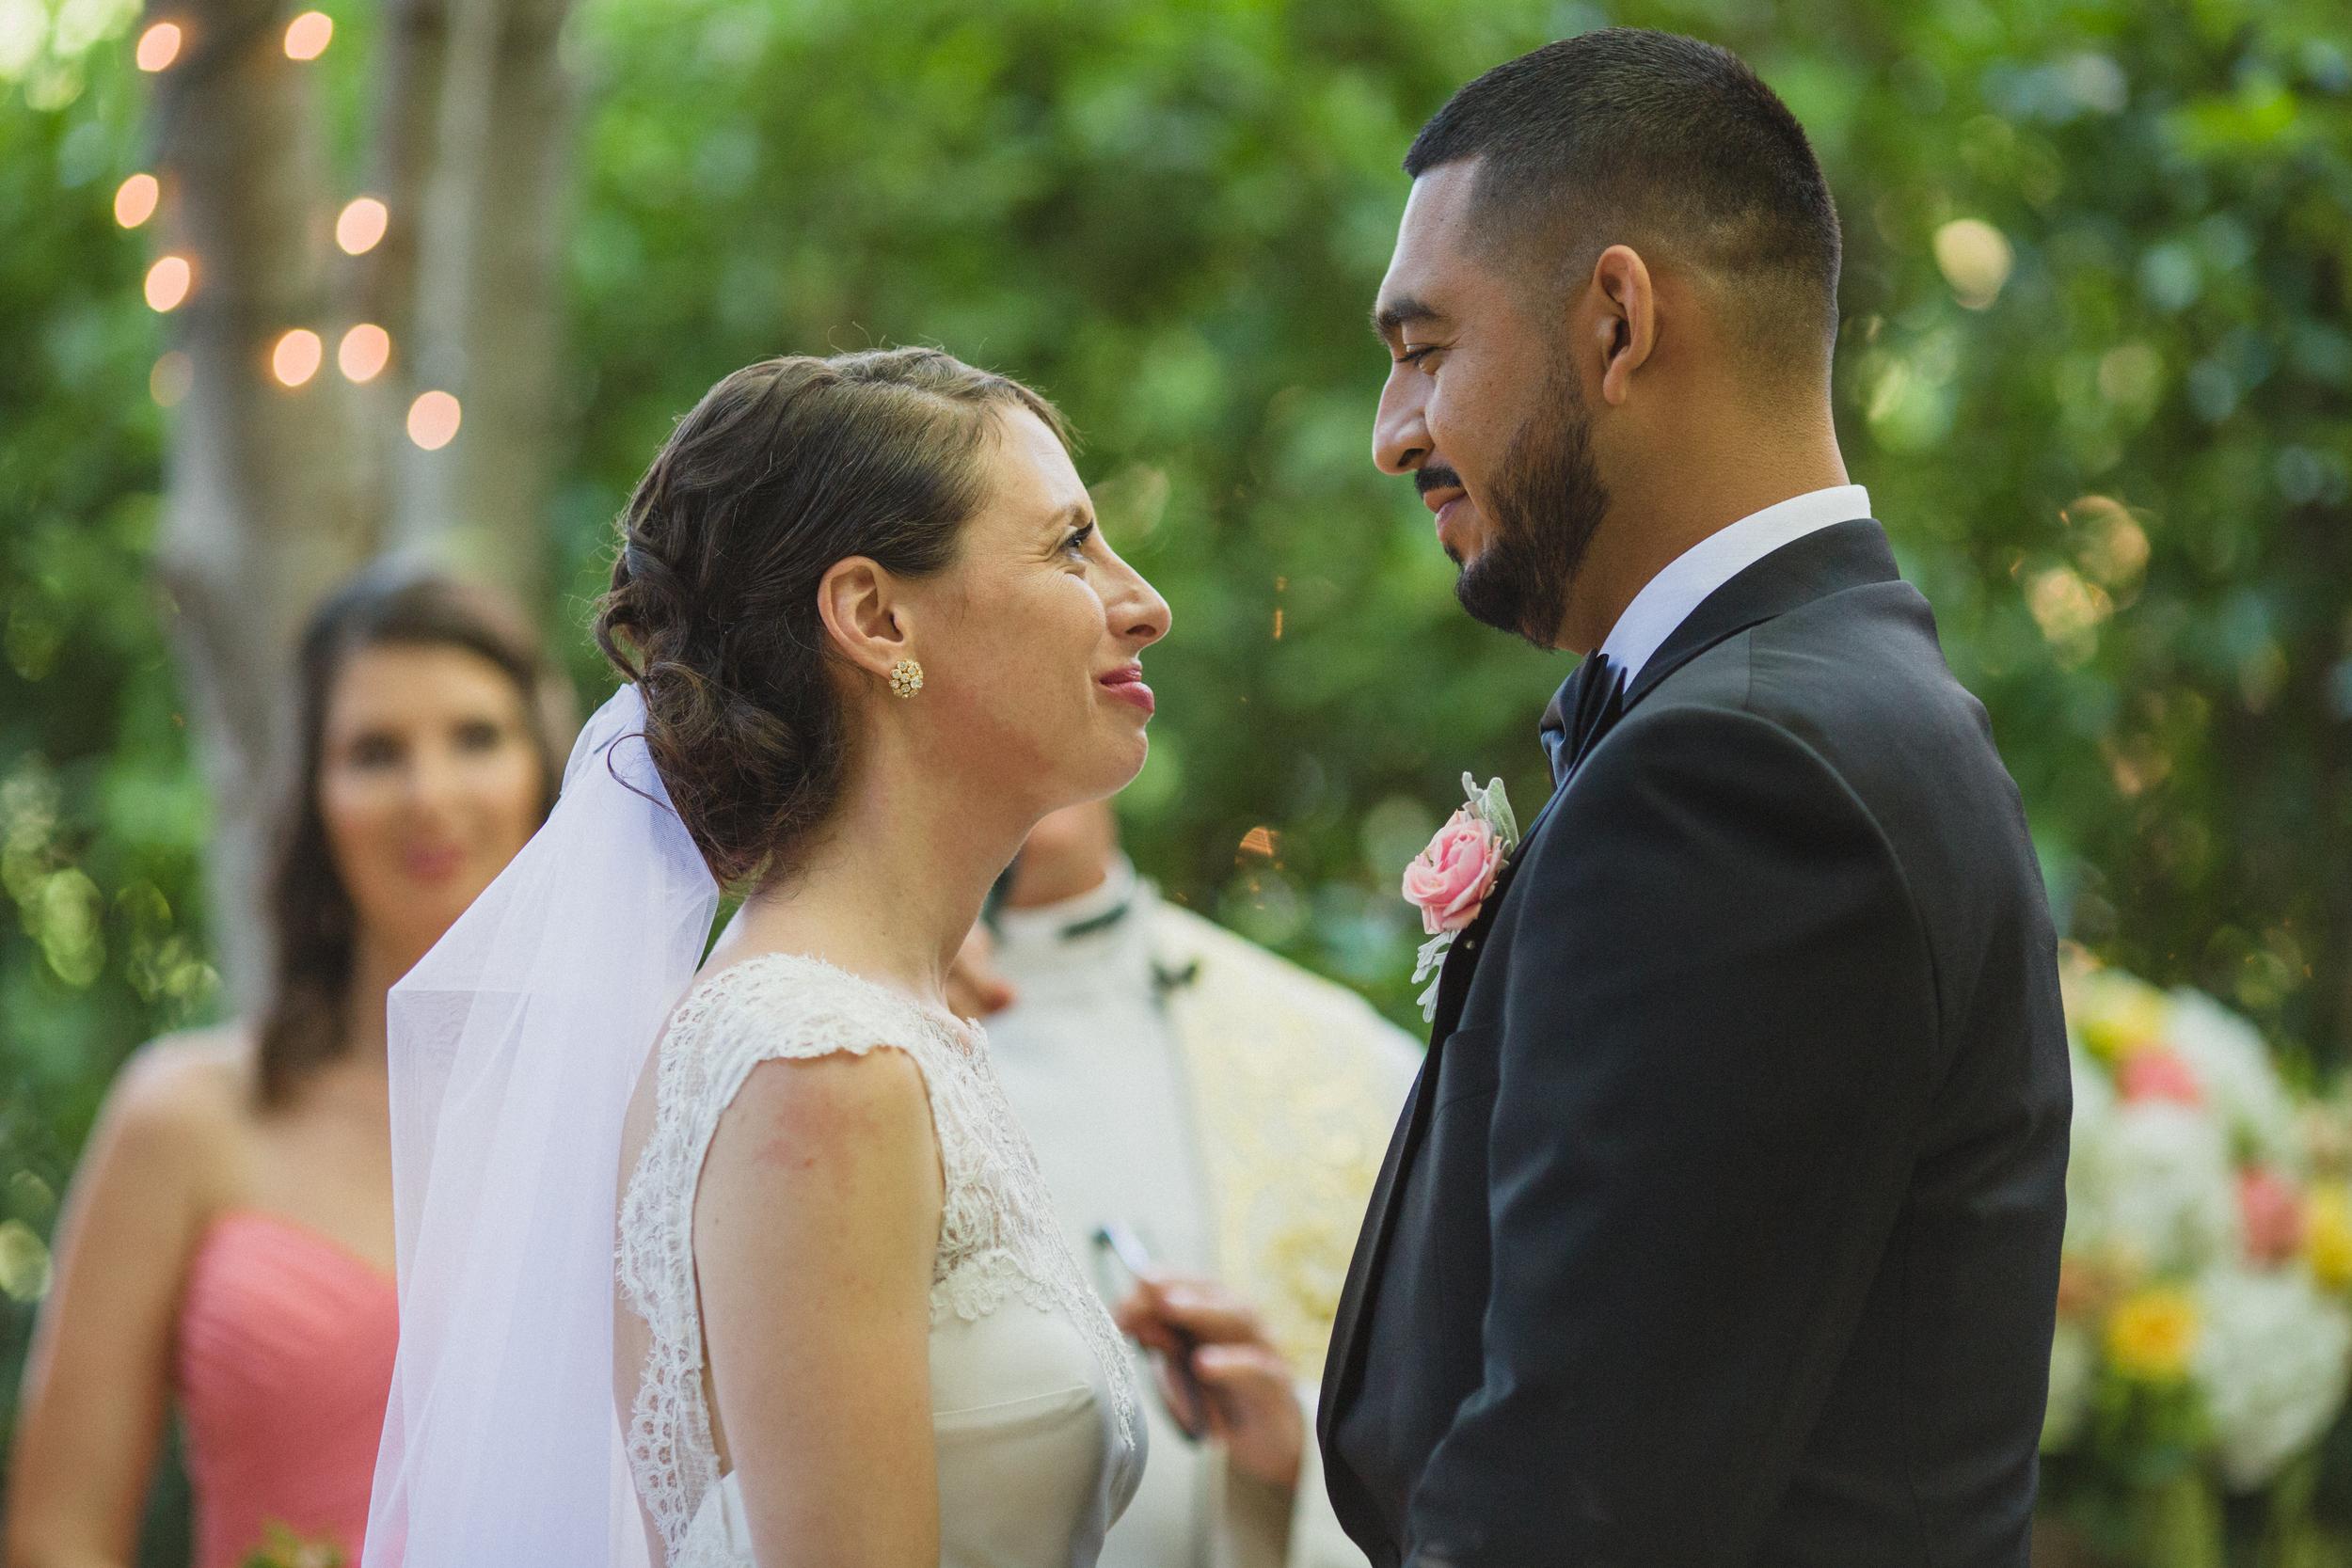 053 Hartley Botanica Wedding Photography Cotton Love Studios.jpg